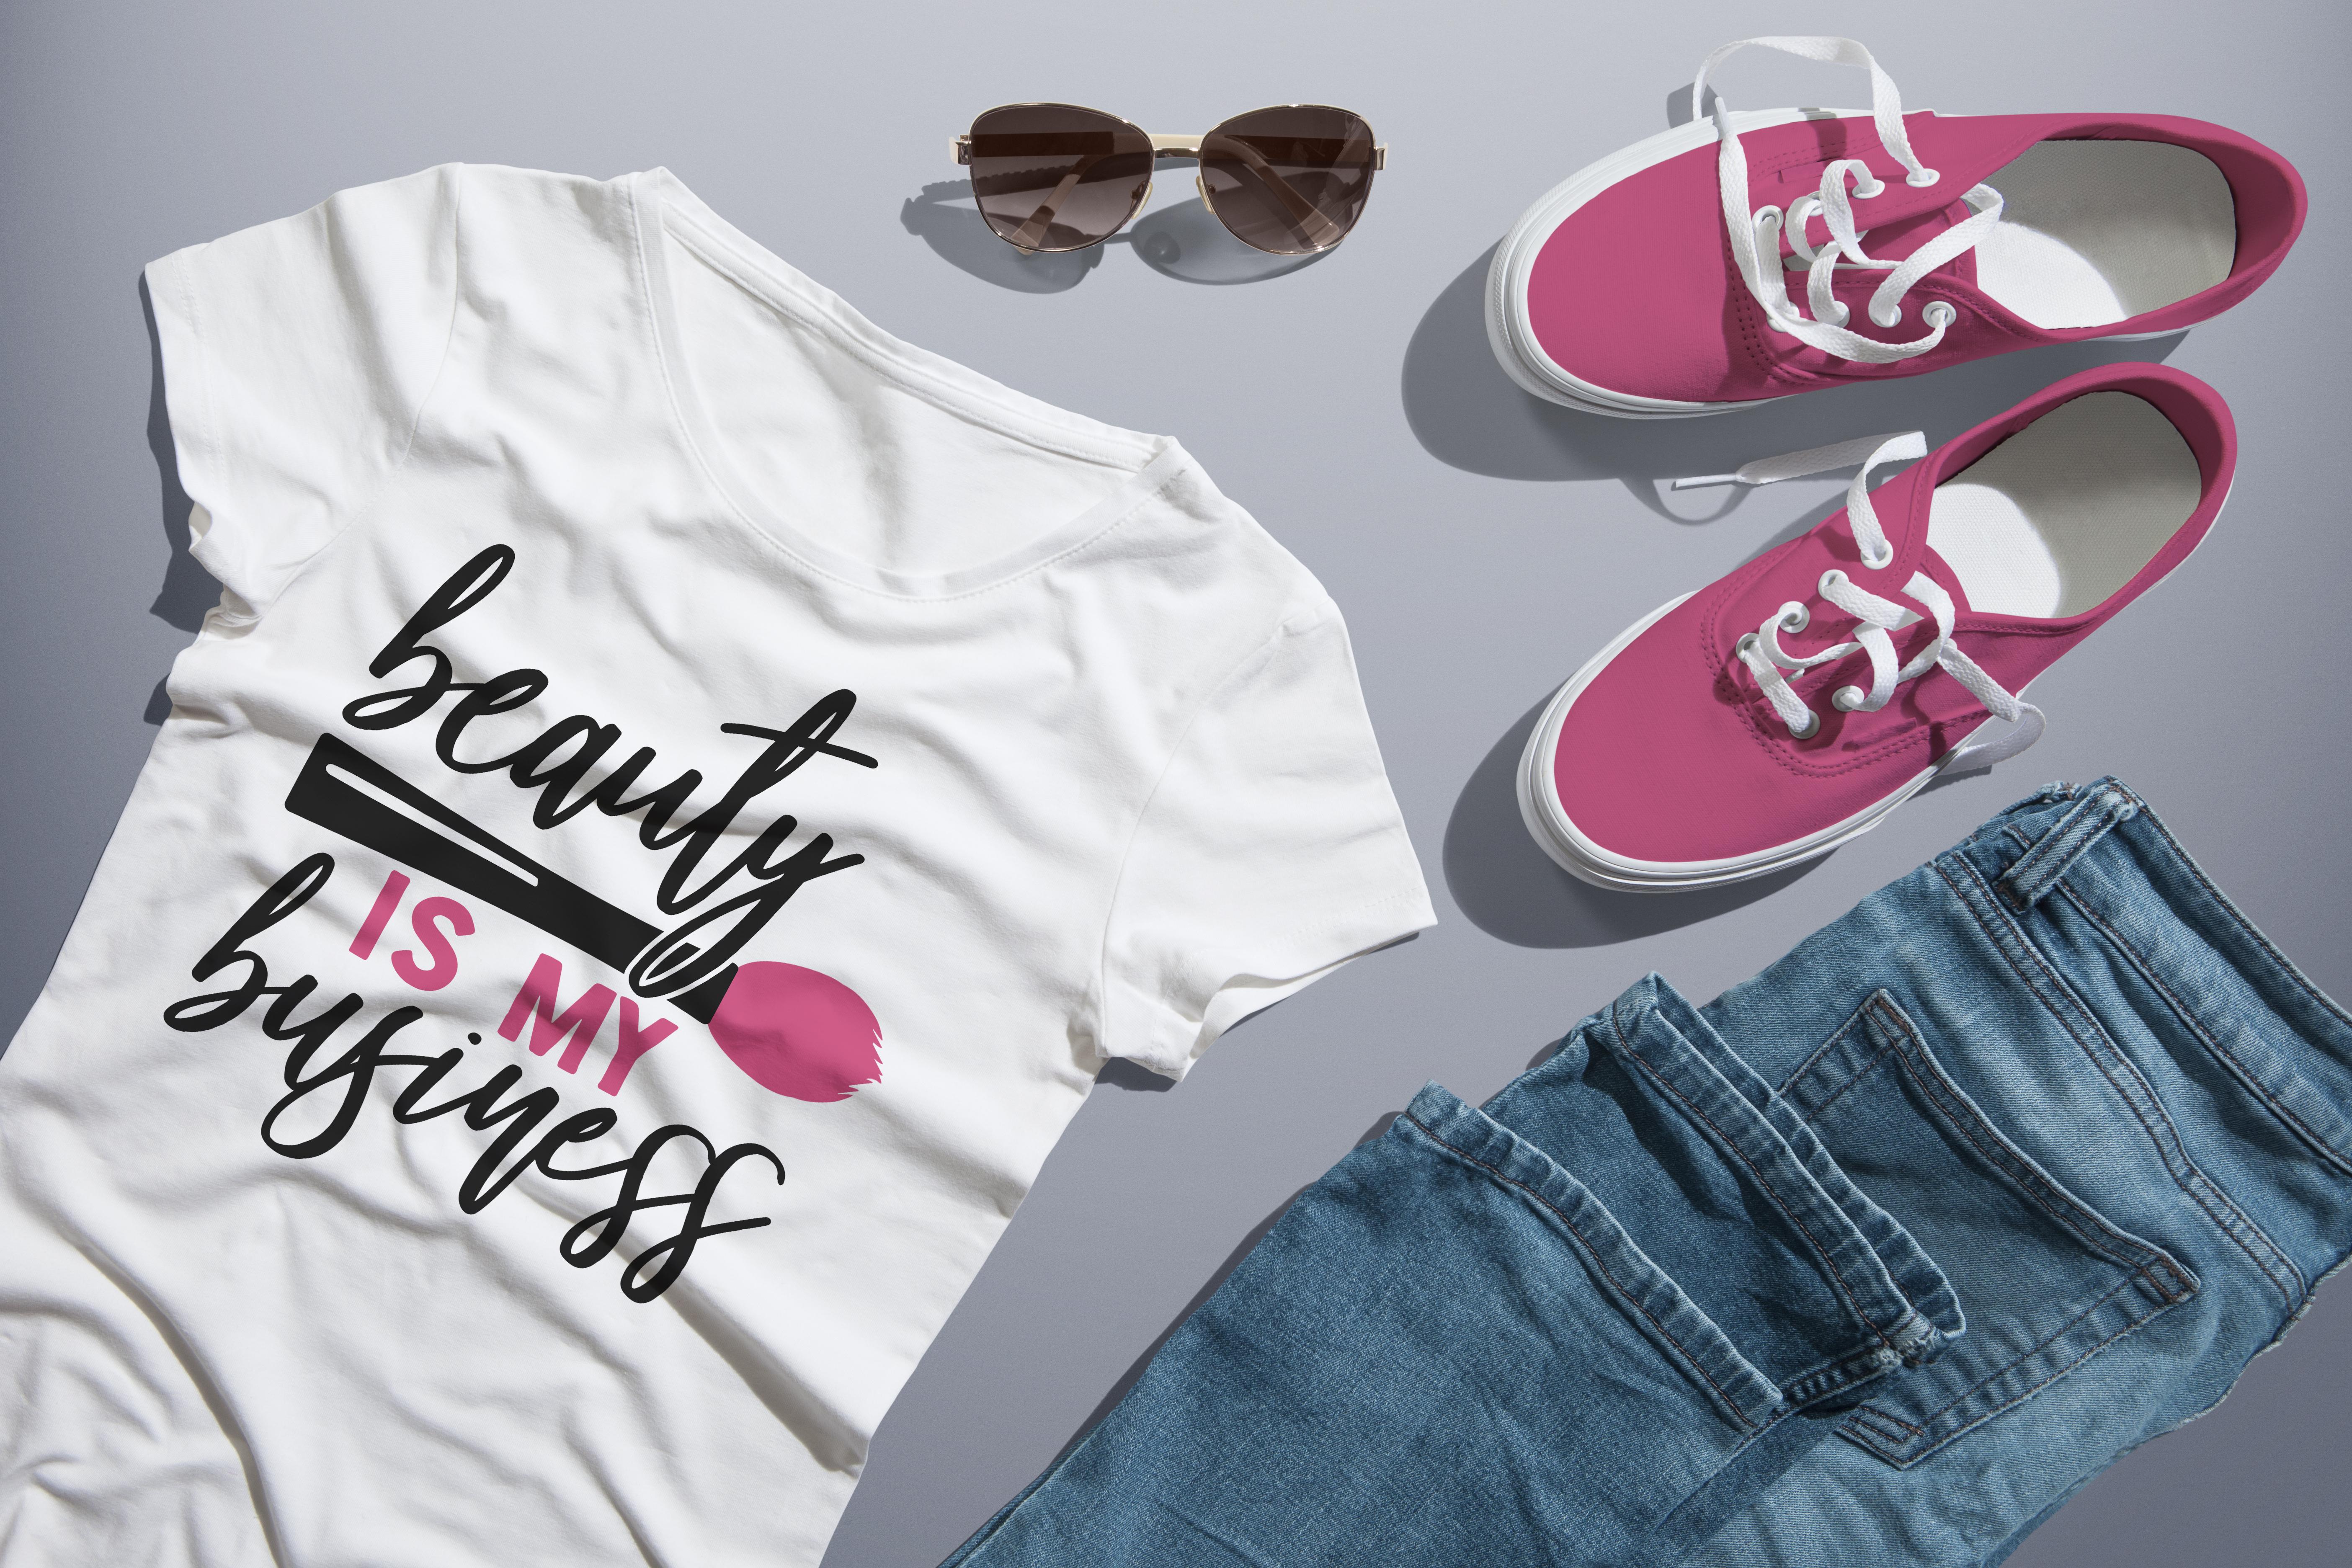 Beauty is My Hustle T-shirt Mockup